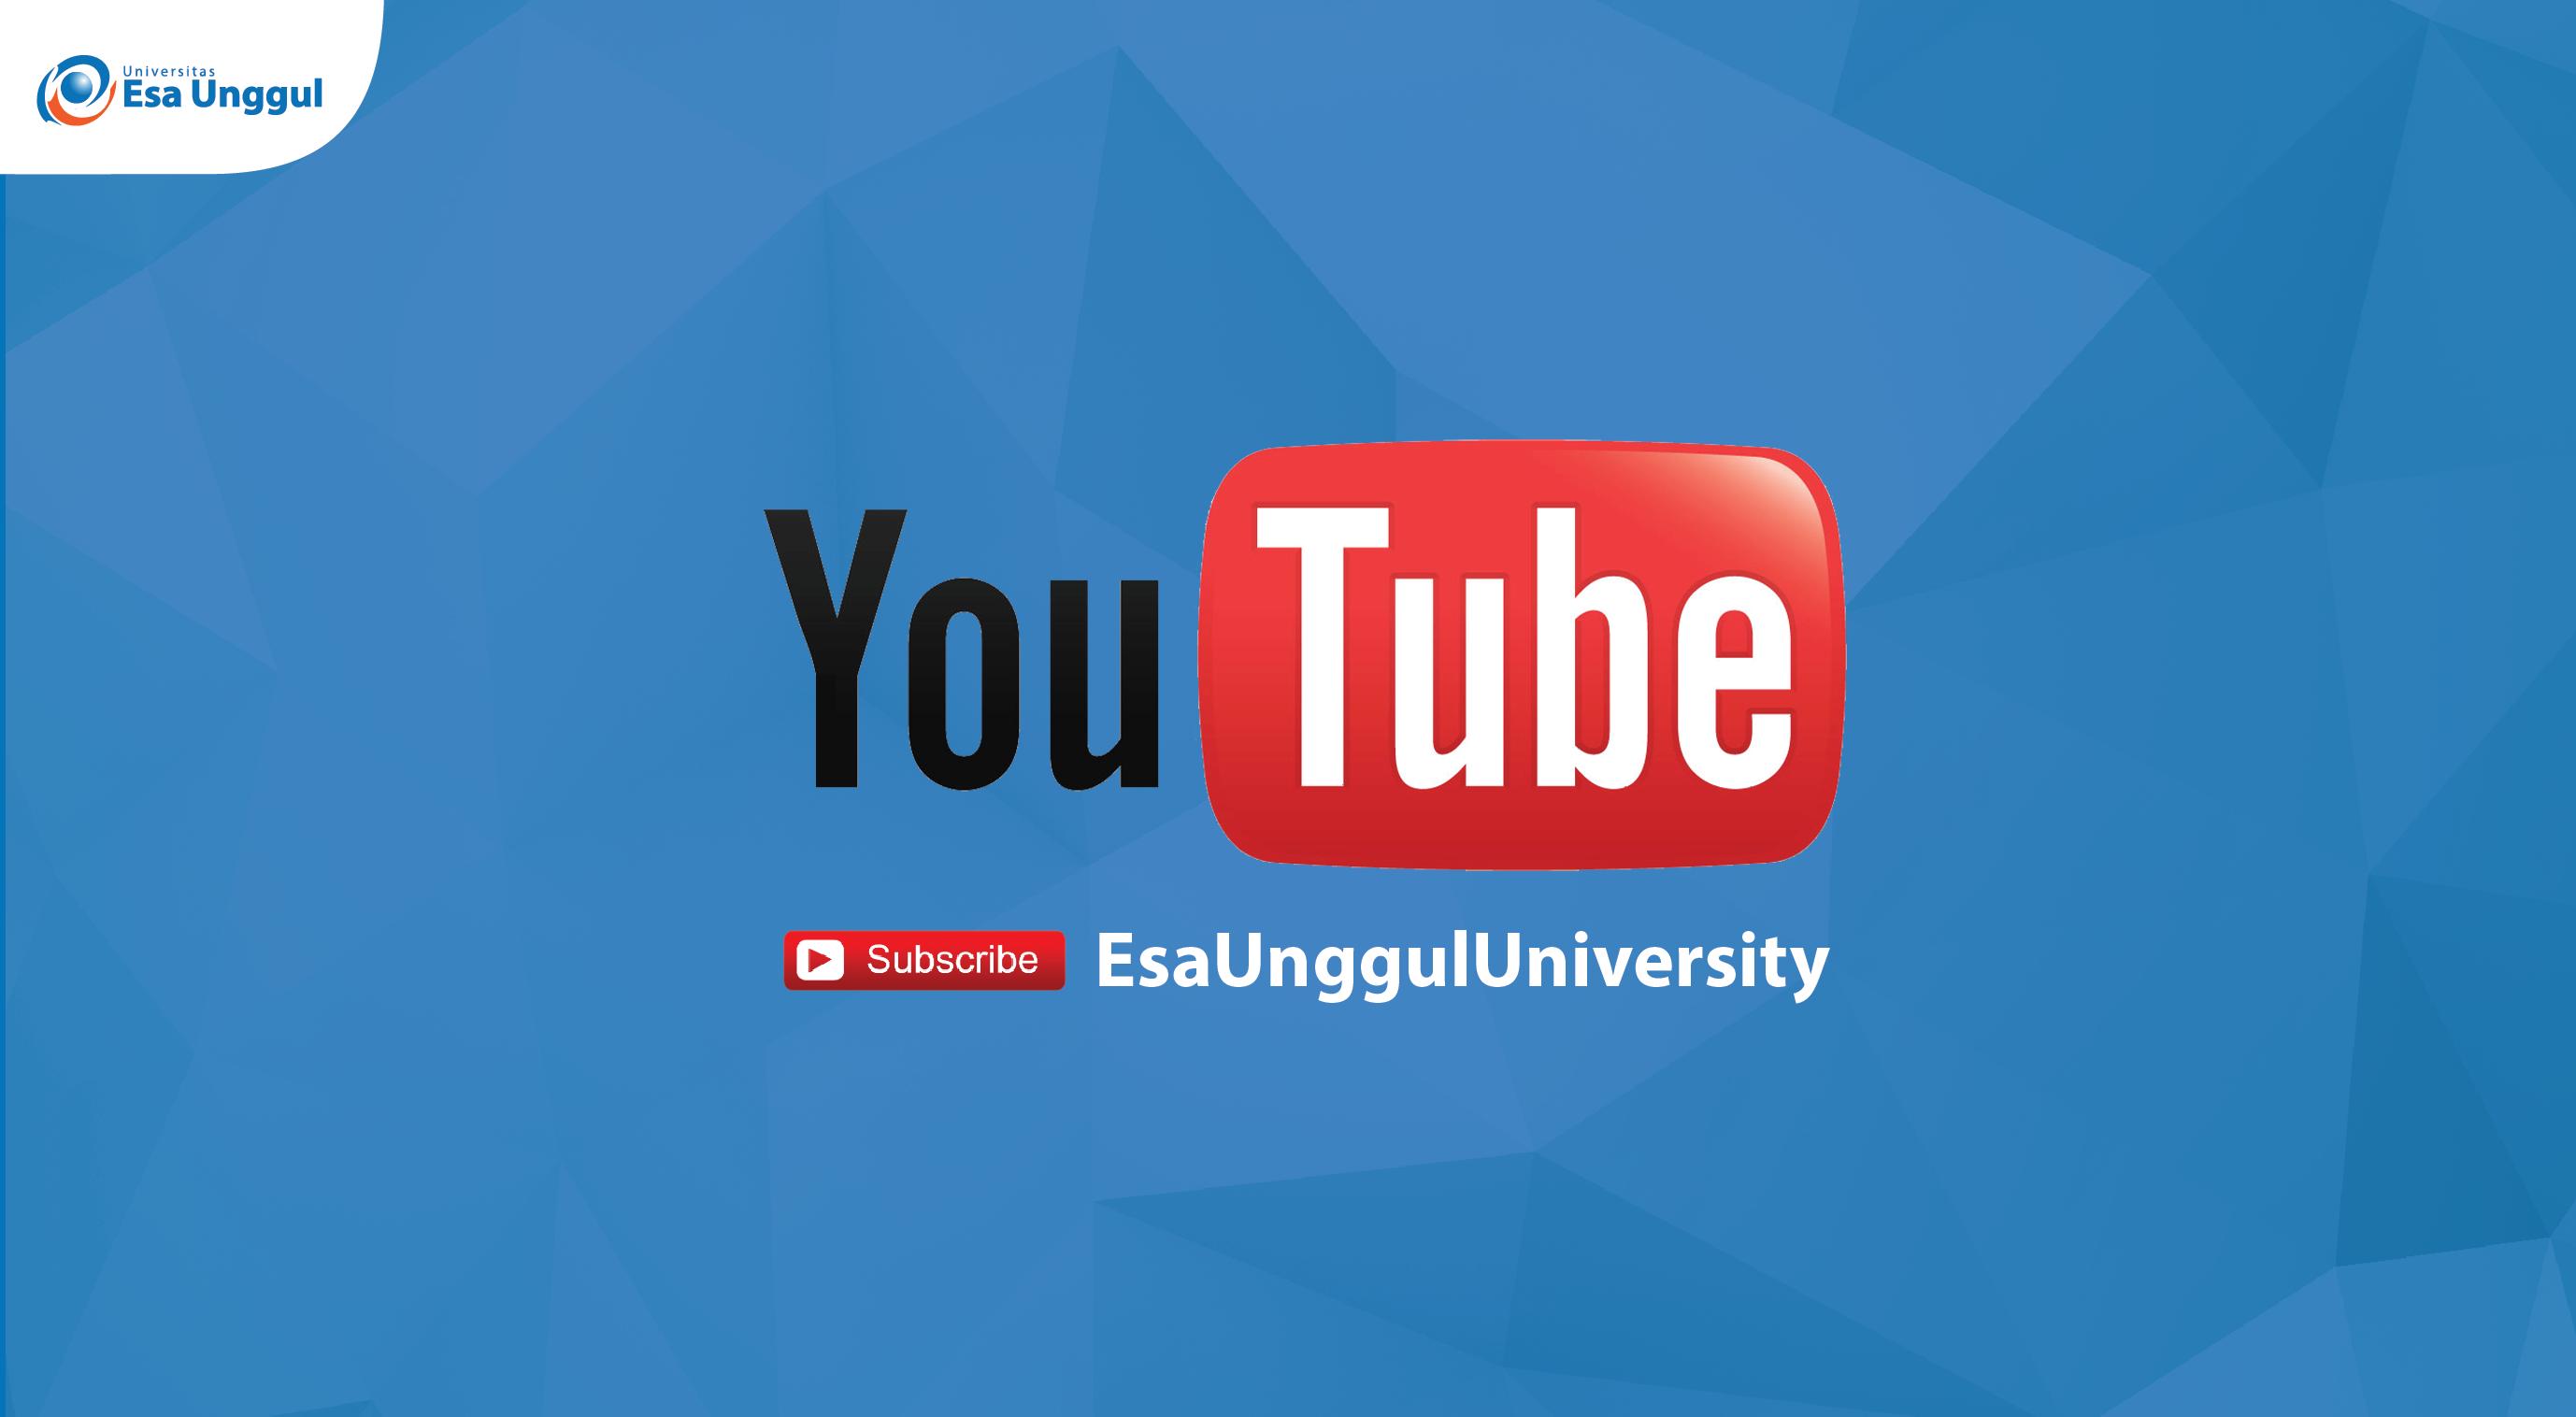 Yuk Gabung di Youtube Universitas Esa Unggul